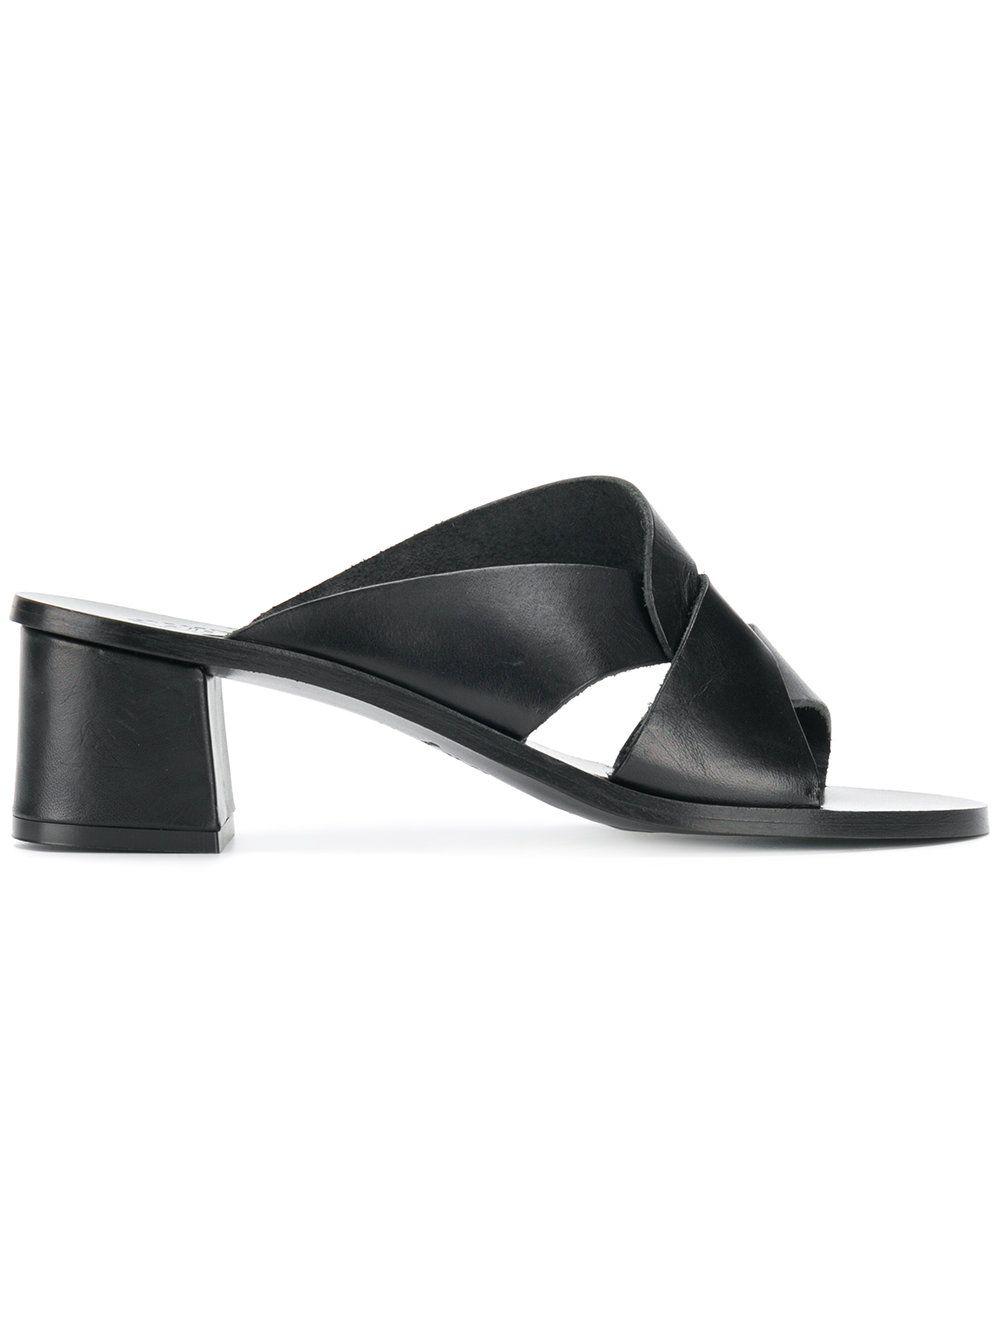 Ala?a Exotic Leathers Sandals Amazon Cheap Online Buy Cheap Websites isU3N6AwHf